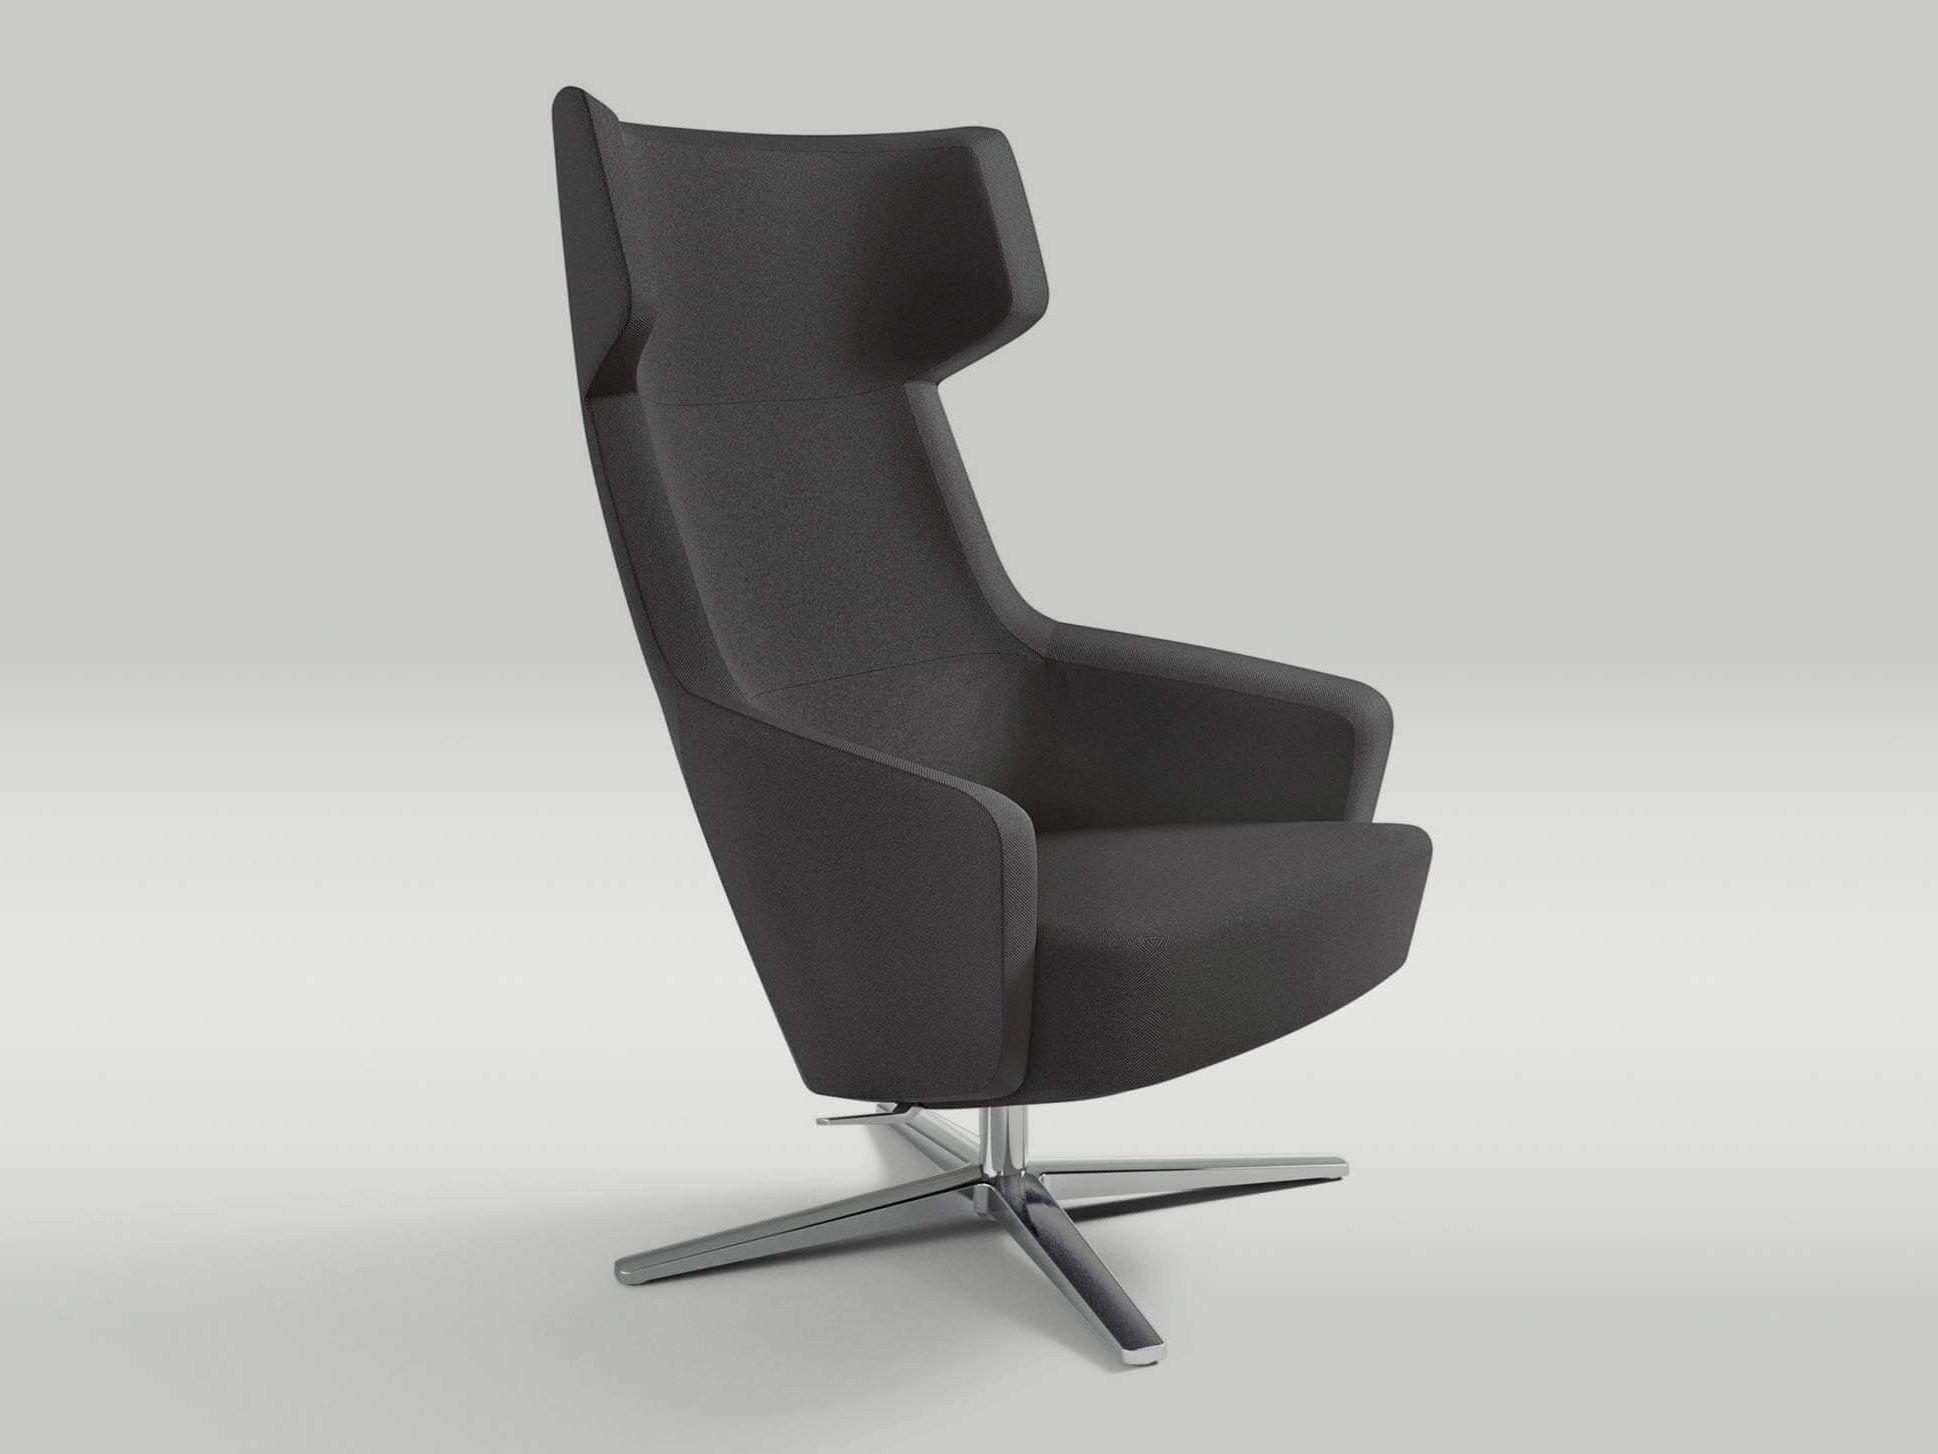 Recliner Armchair With Base With Armrests ARTEMO By Brunner Design Roland  Schmidt